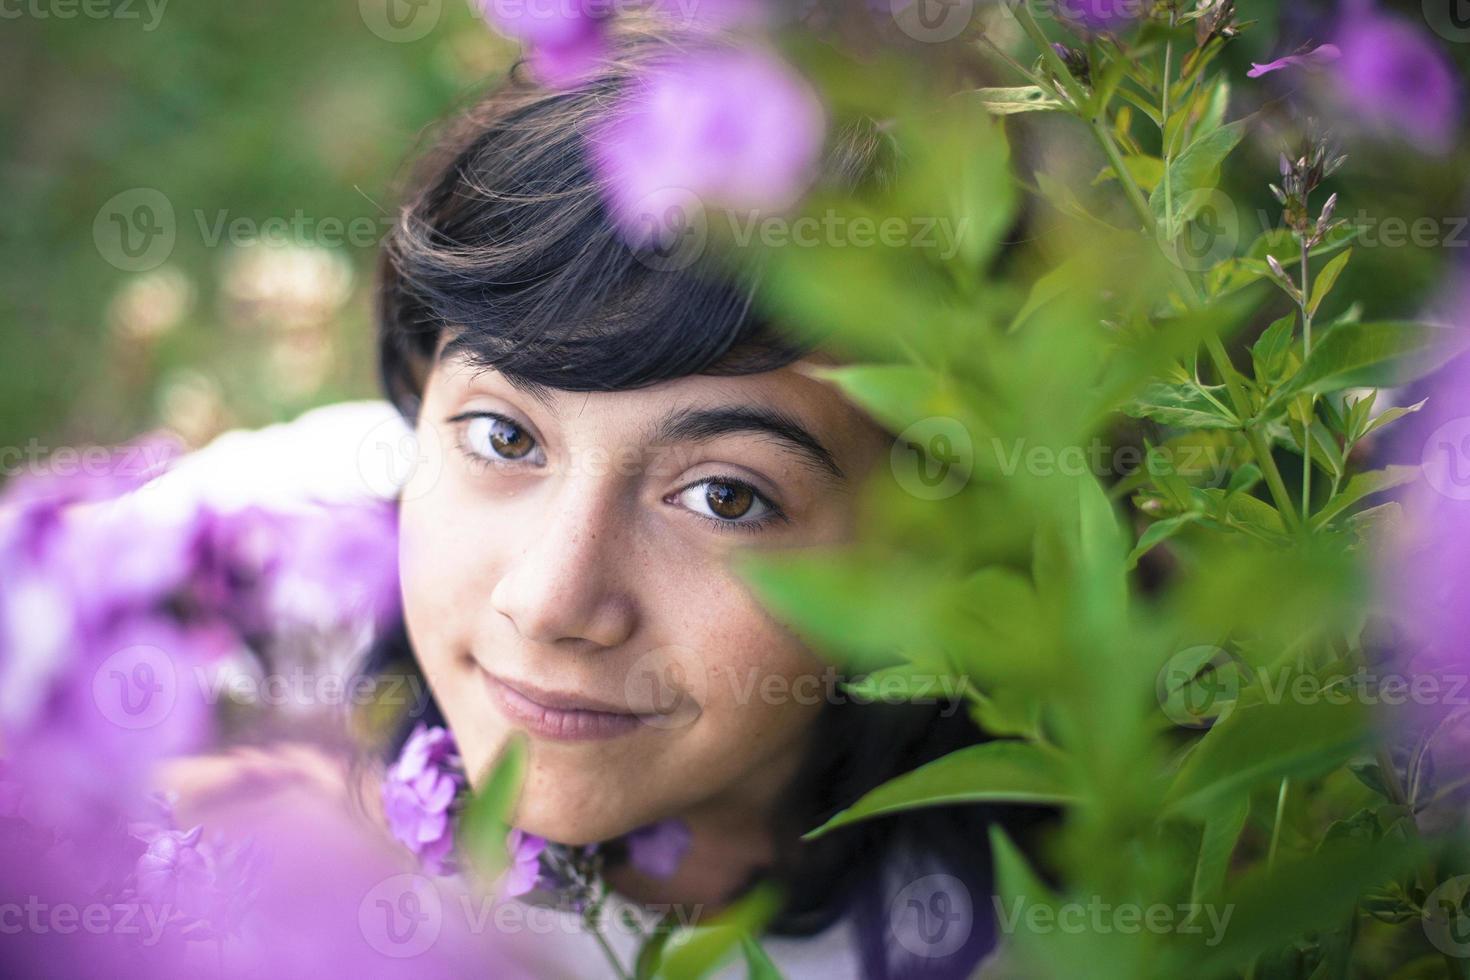 fechar quente retrato de uma linda menina adolescente. foto